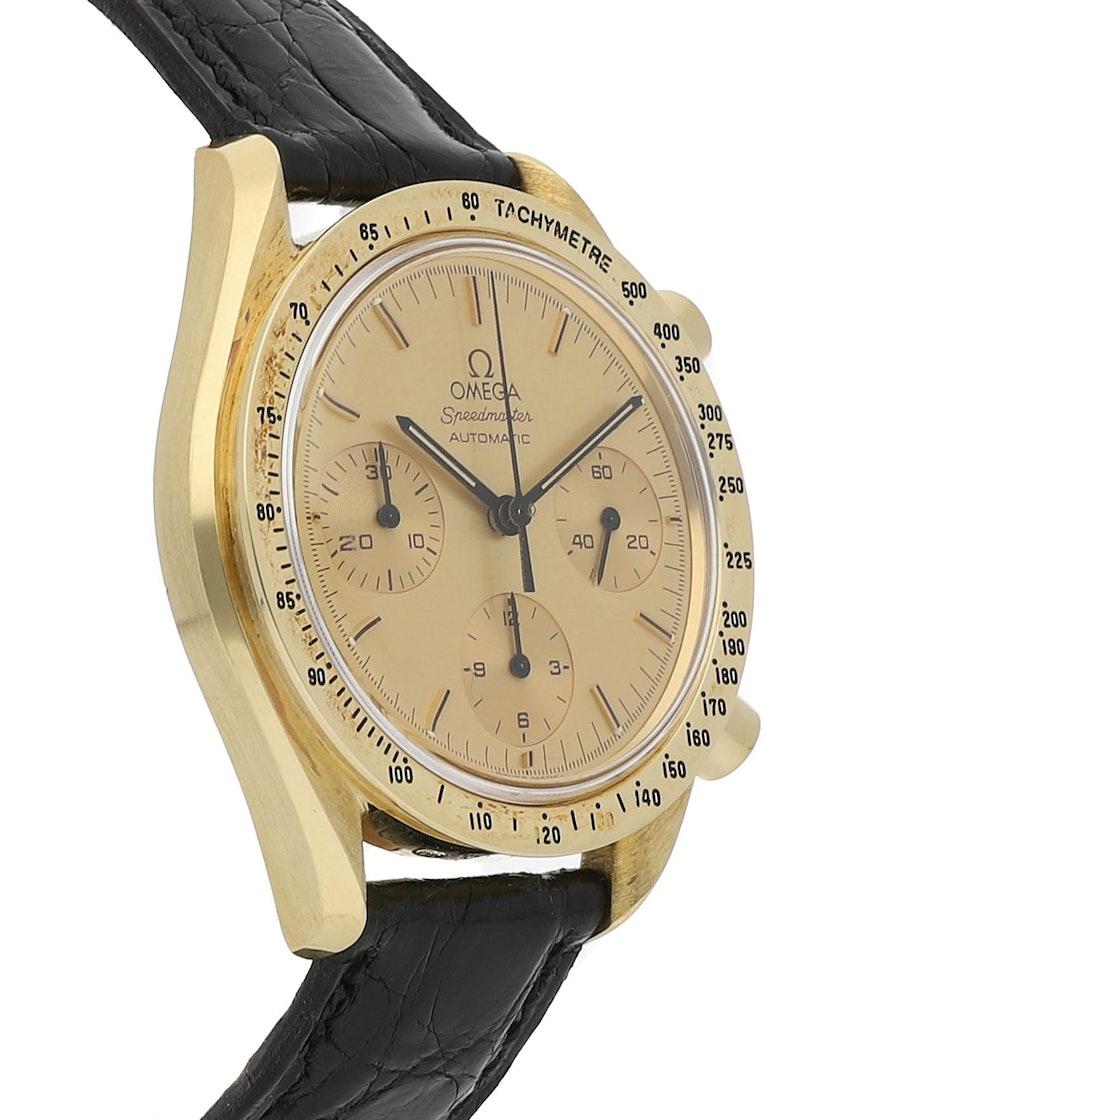 Omega Speedmaster Reduced Chronograph 3614.10.10